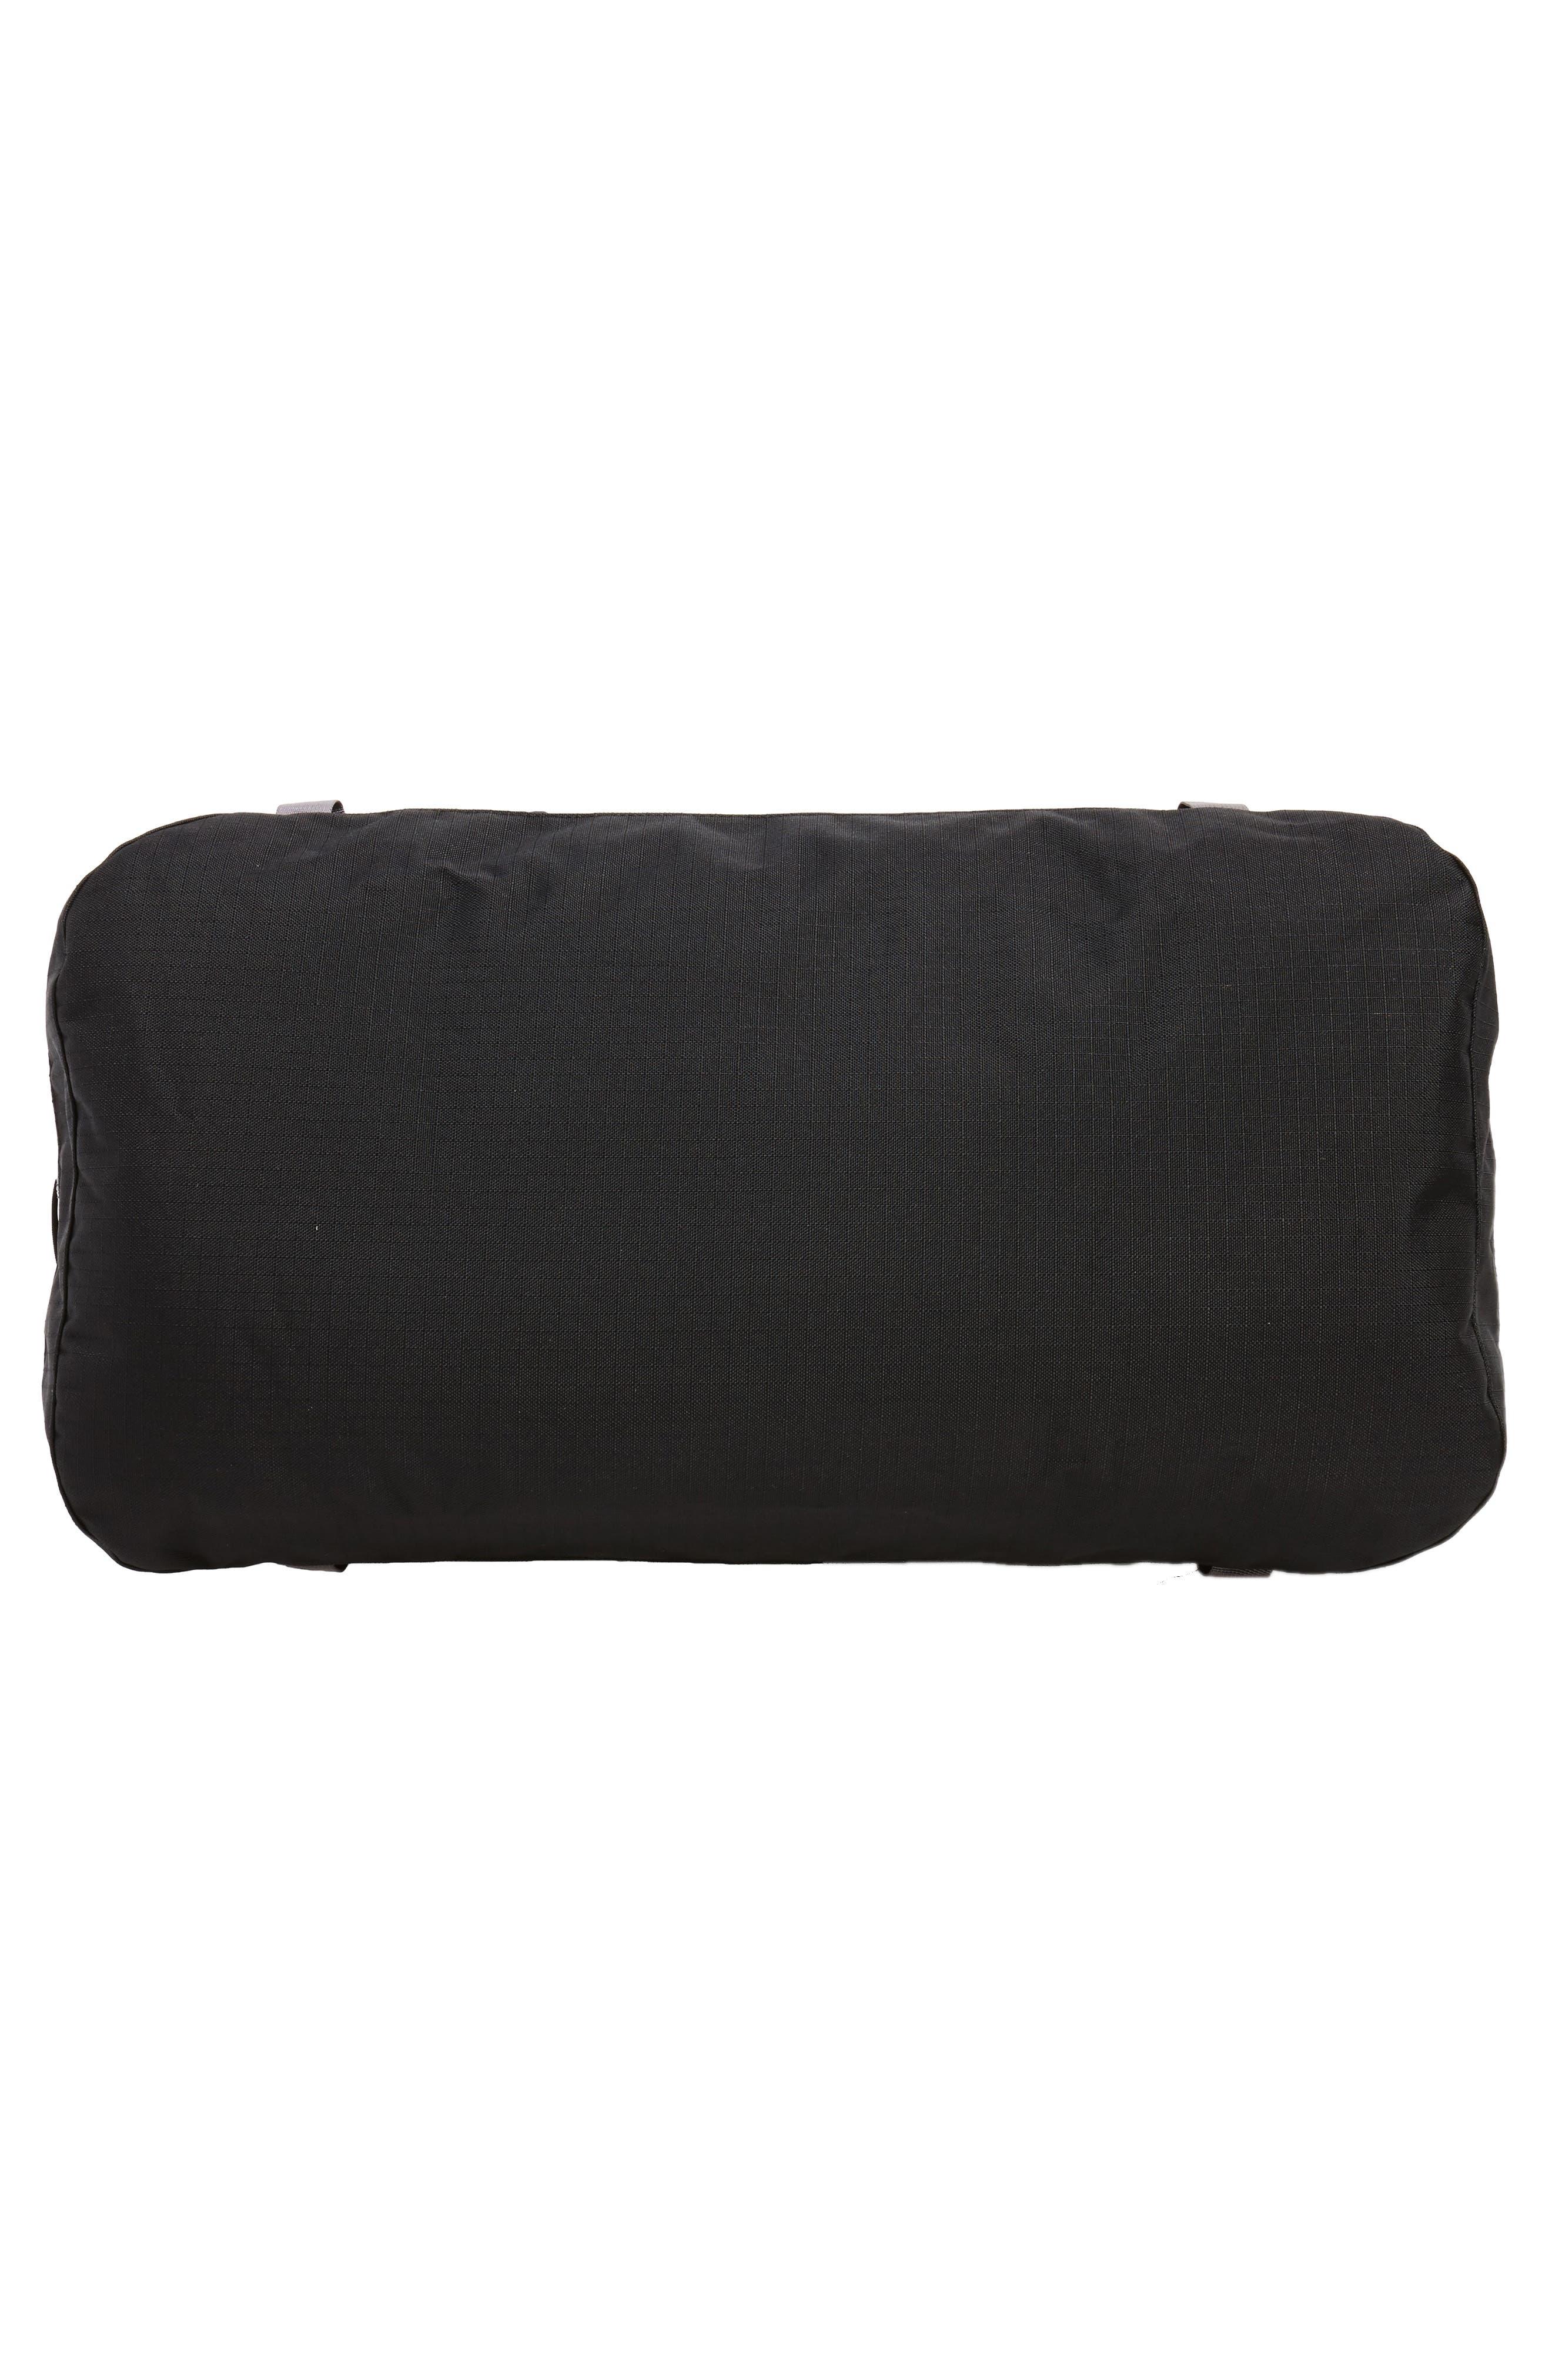 PATAGONIA, Black Hole Water Repellent 60-Liter Duffle Bag, Alternate thumbnail 6, color, BLACK